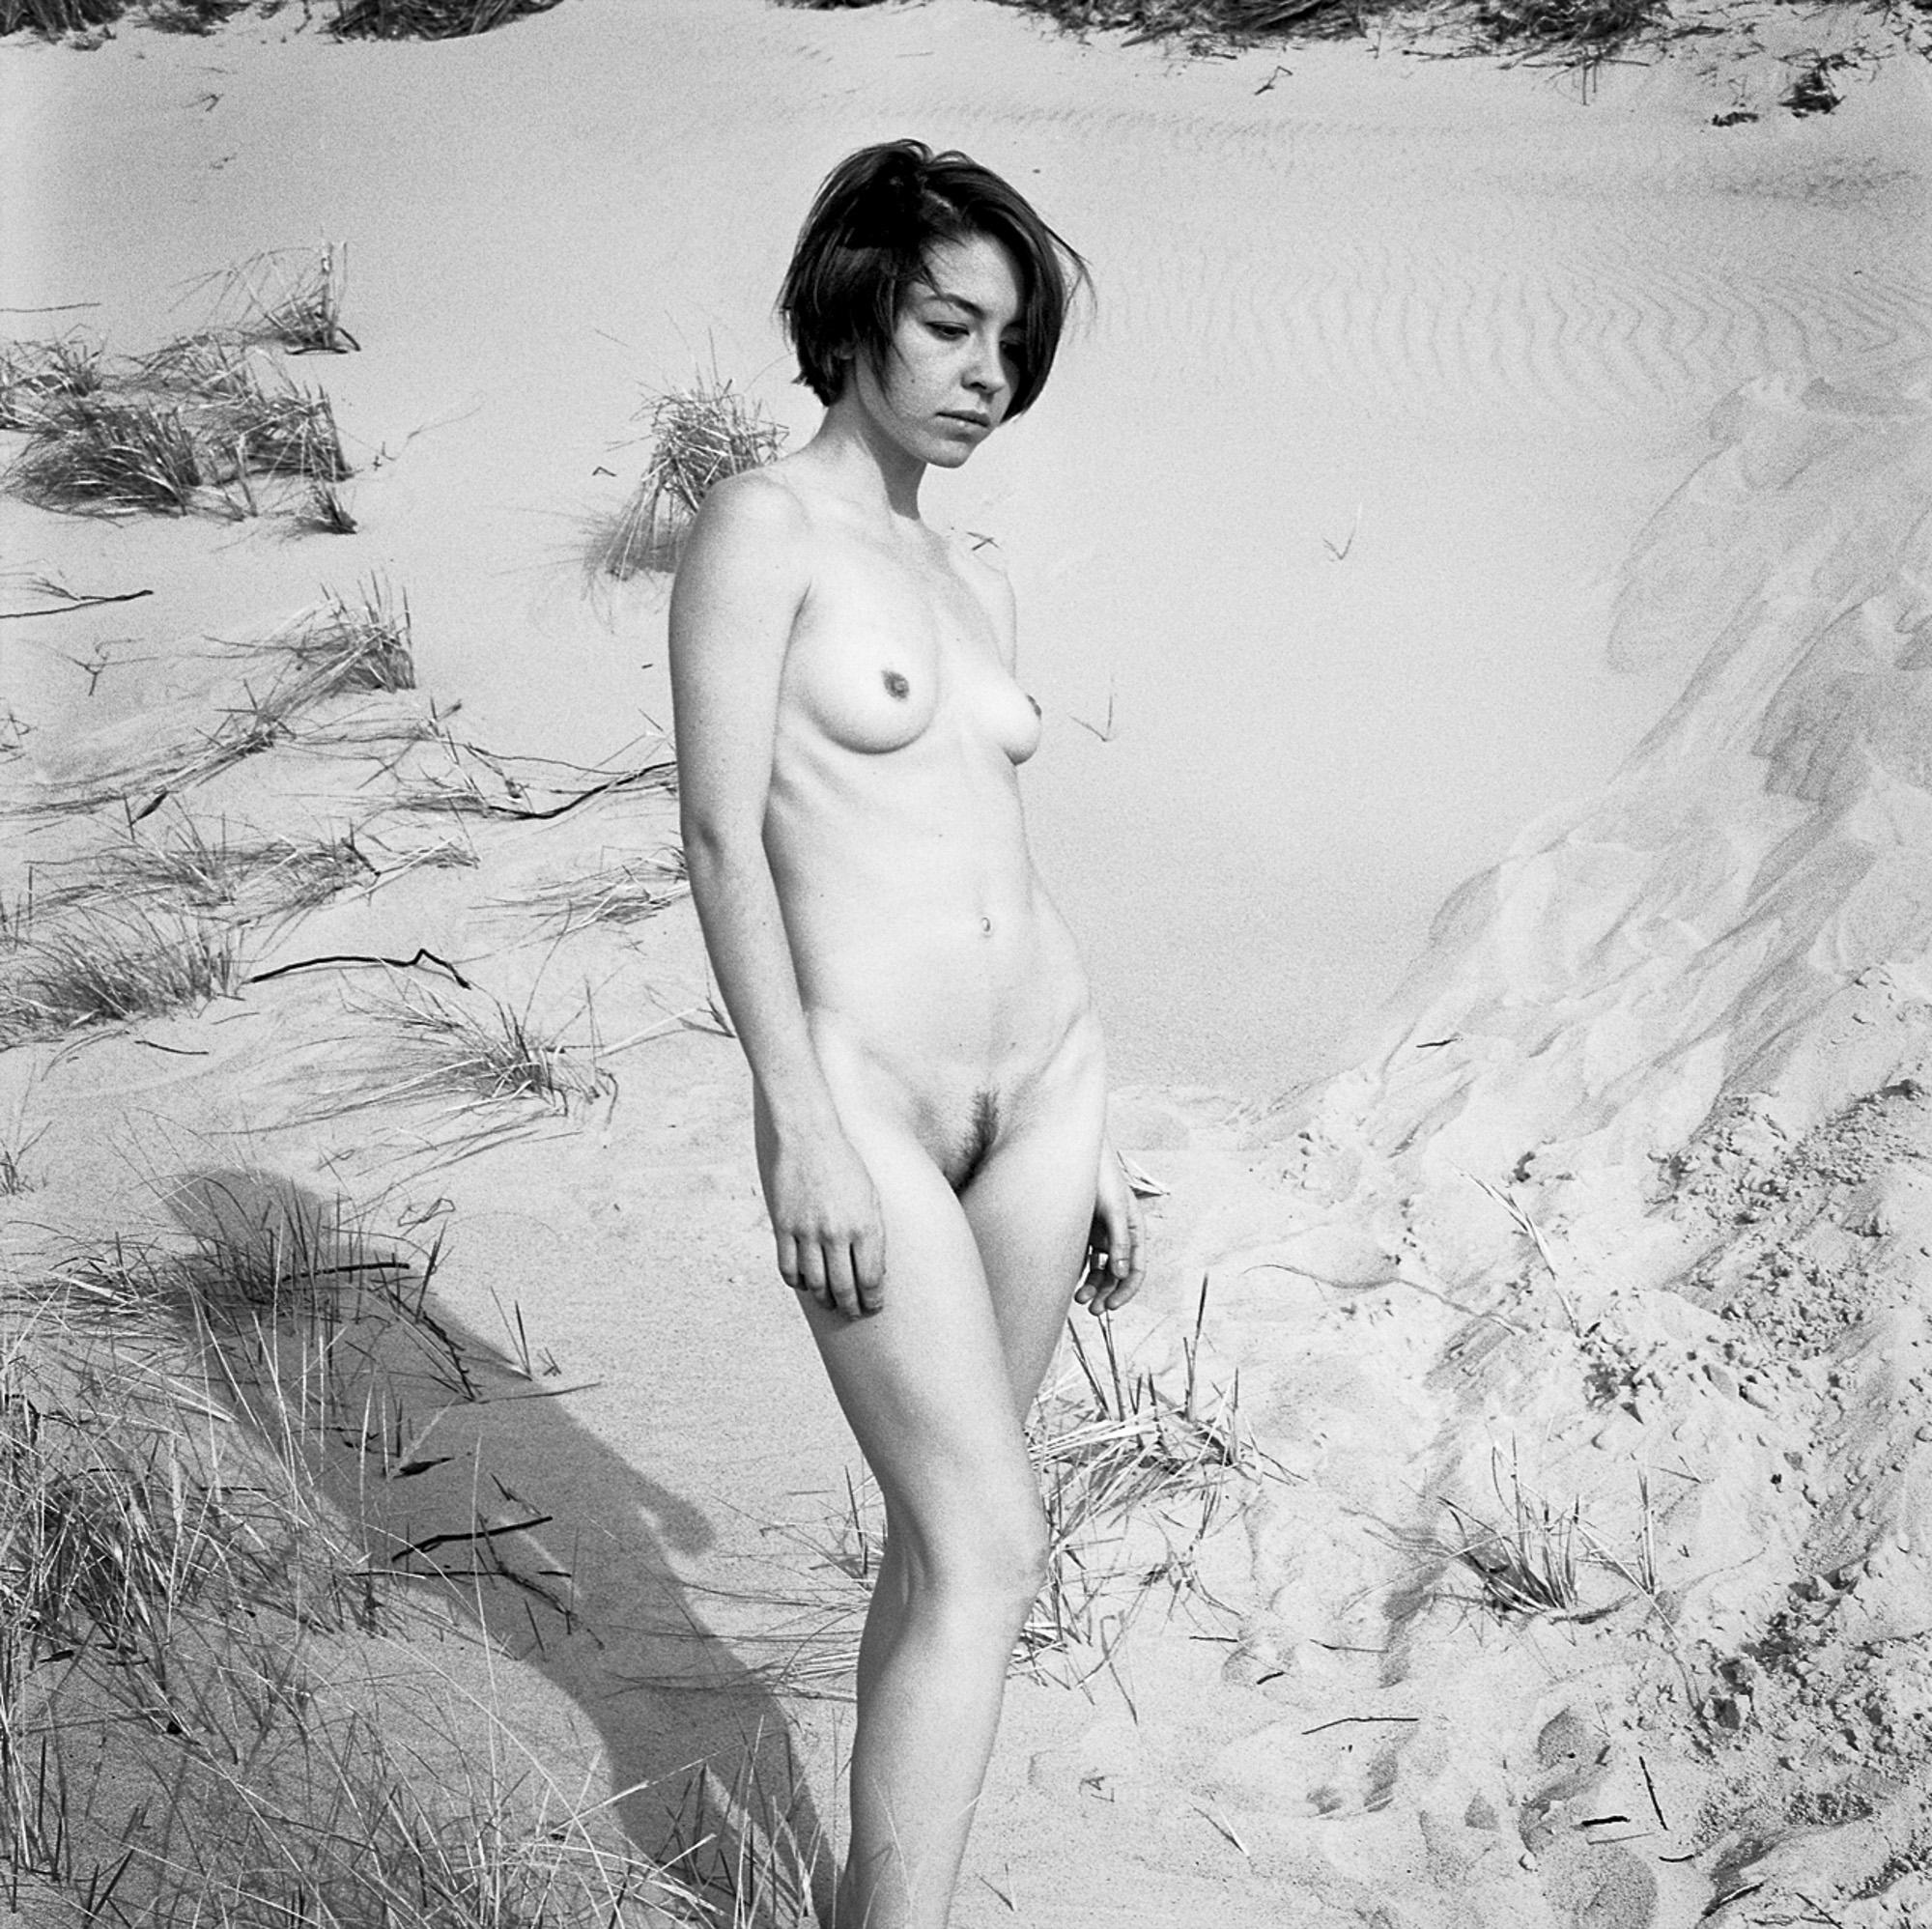 Henrikson Archive Nudes web_6.jpg